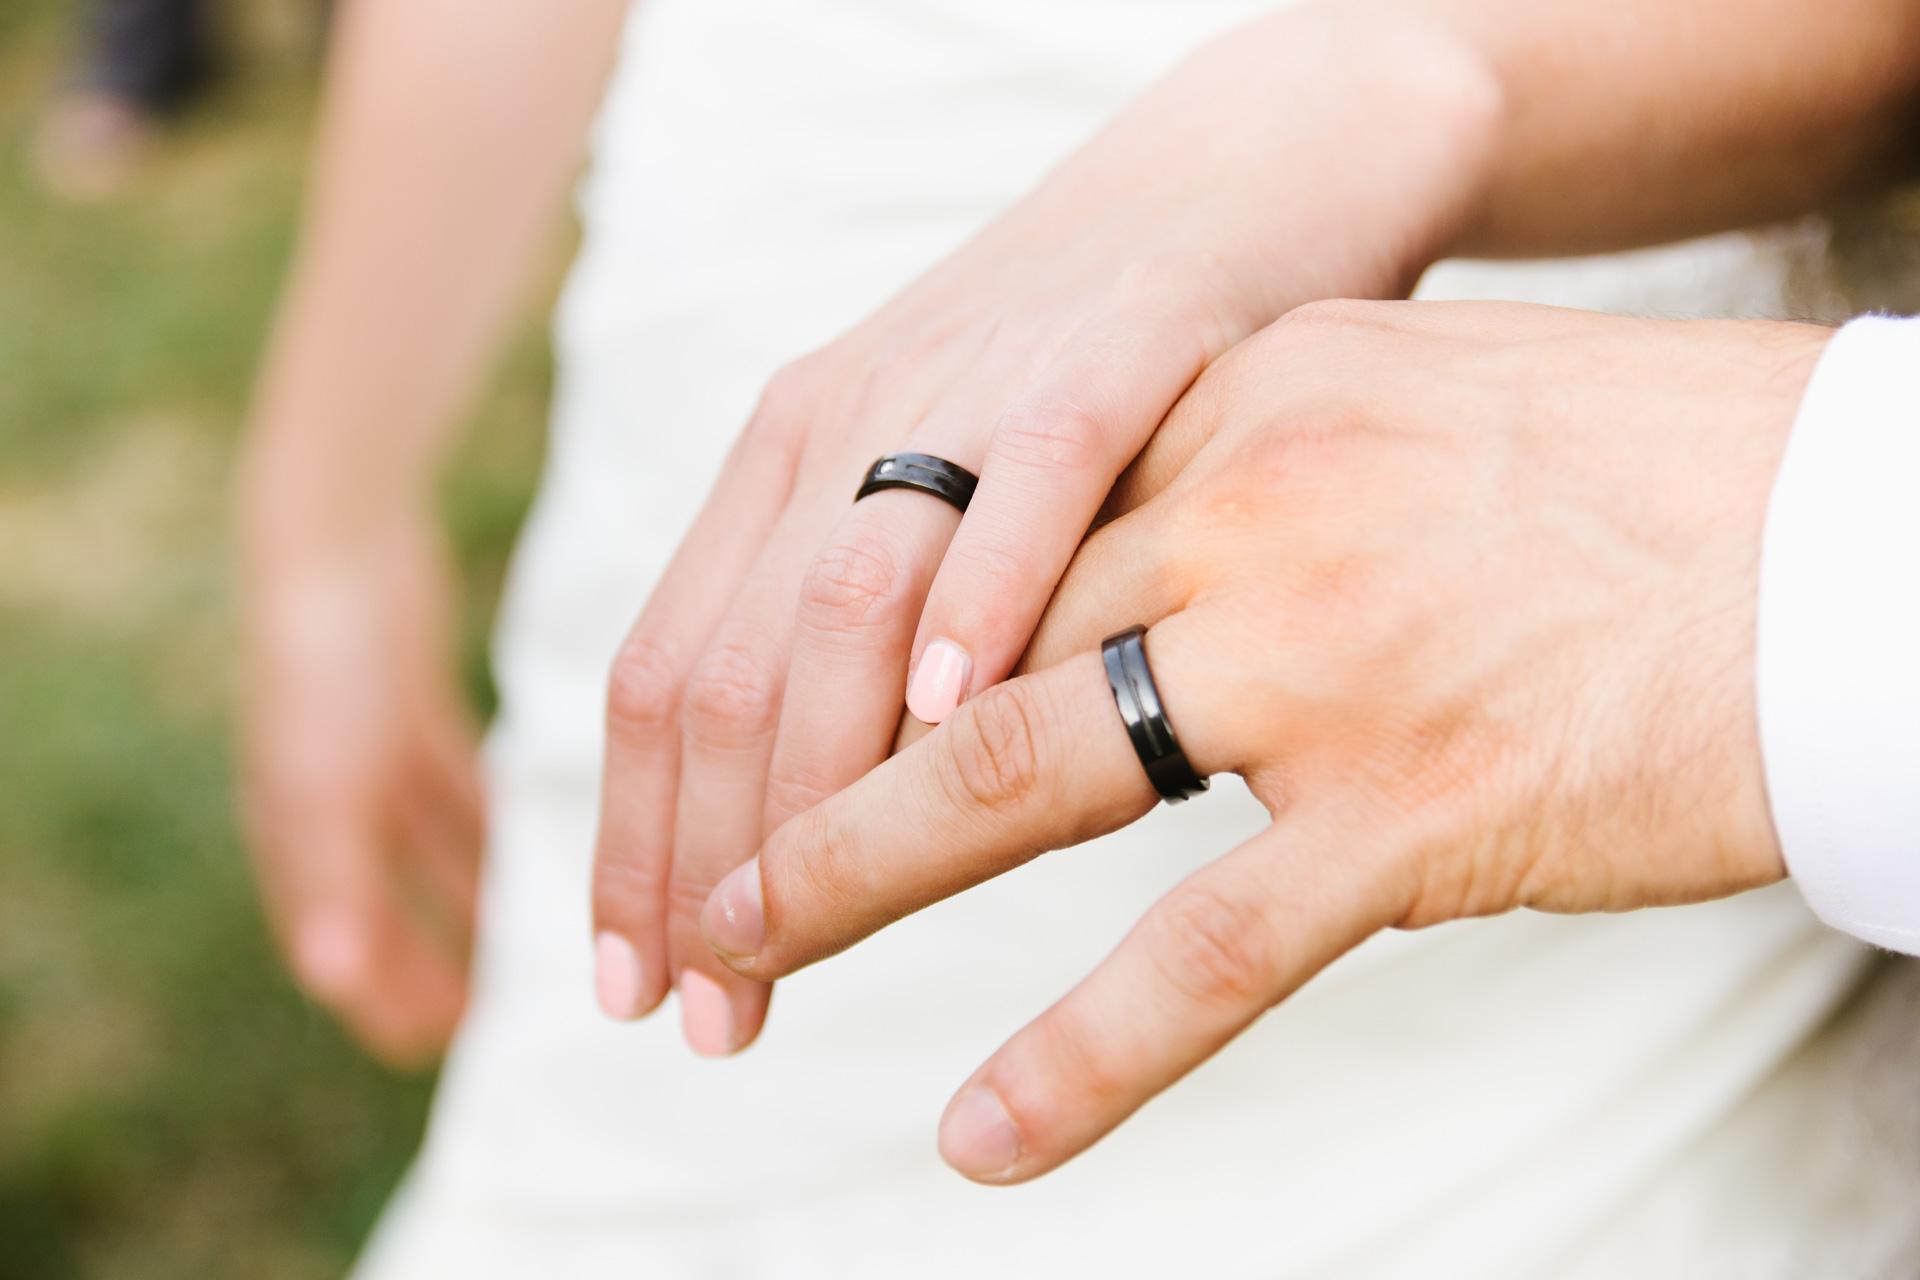 Pixelart_Hochzeitsfotografen_Loerrach_Rheinfelden_Hallwil_Schweiz_Linda-Ramon-1046